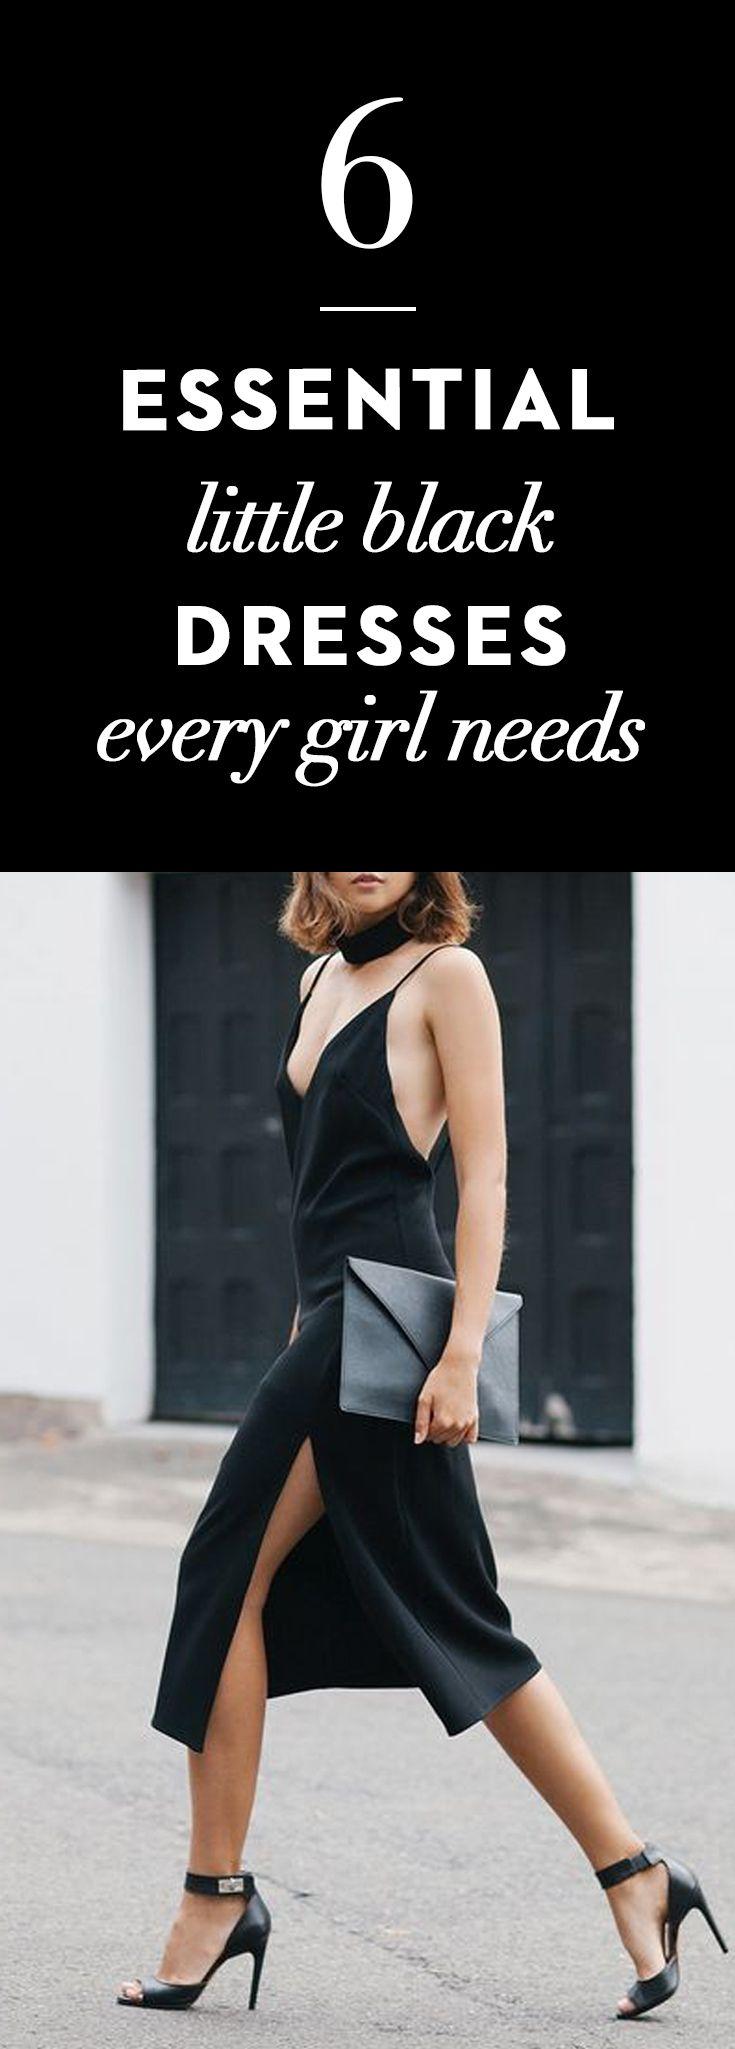 Back to the basics- Black Dresses every girl needs